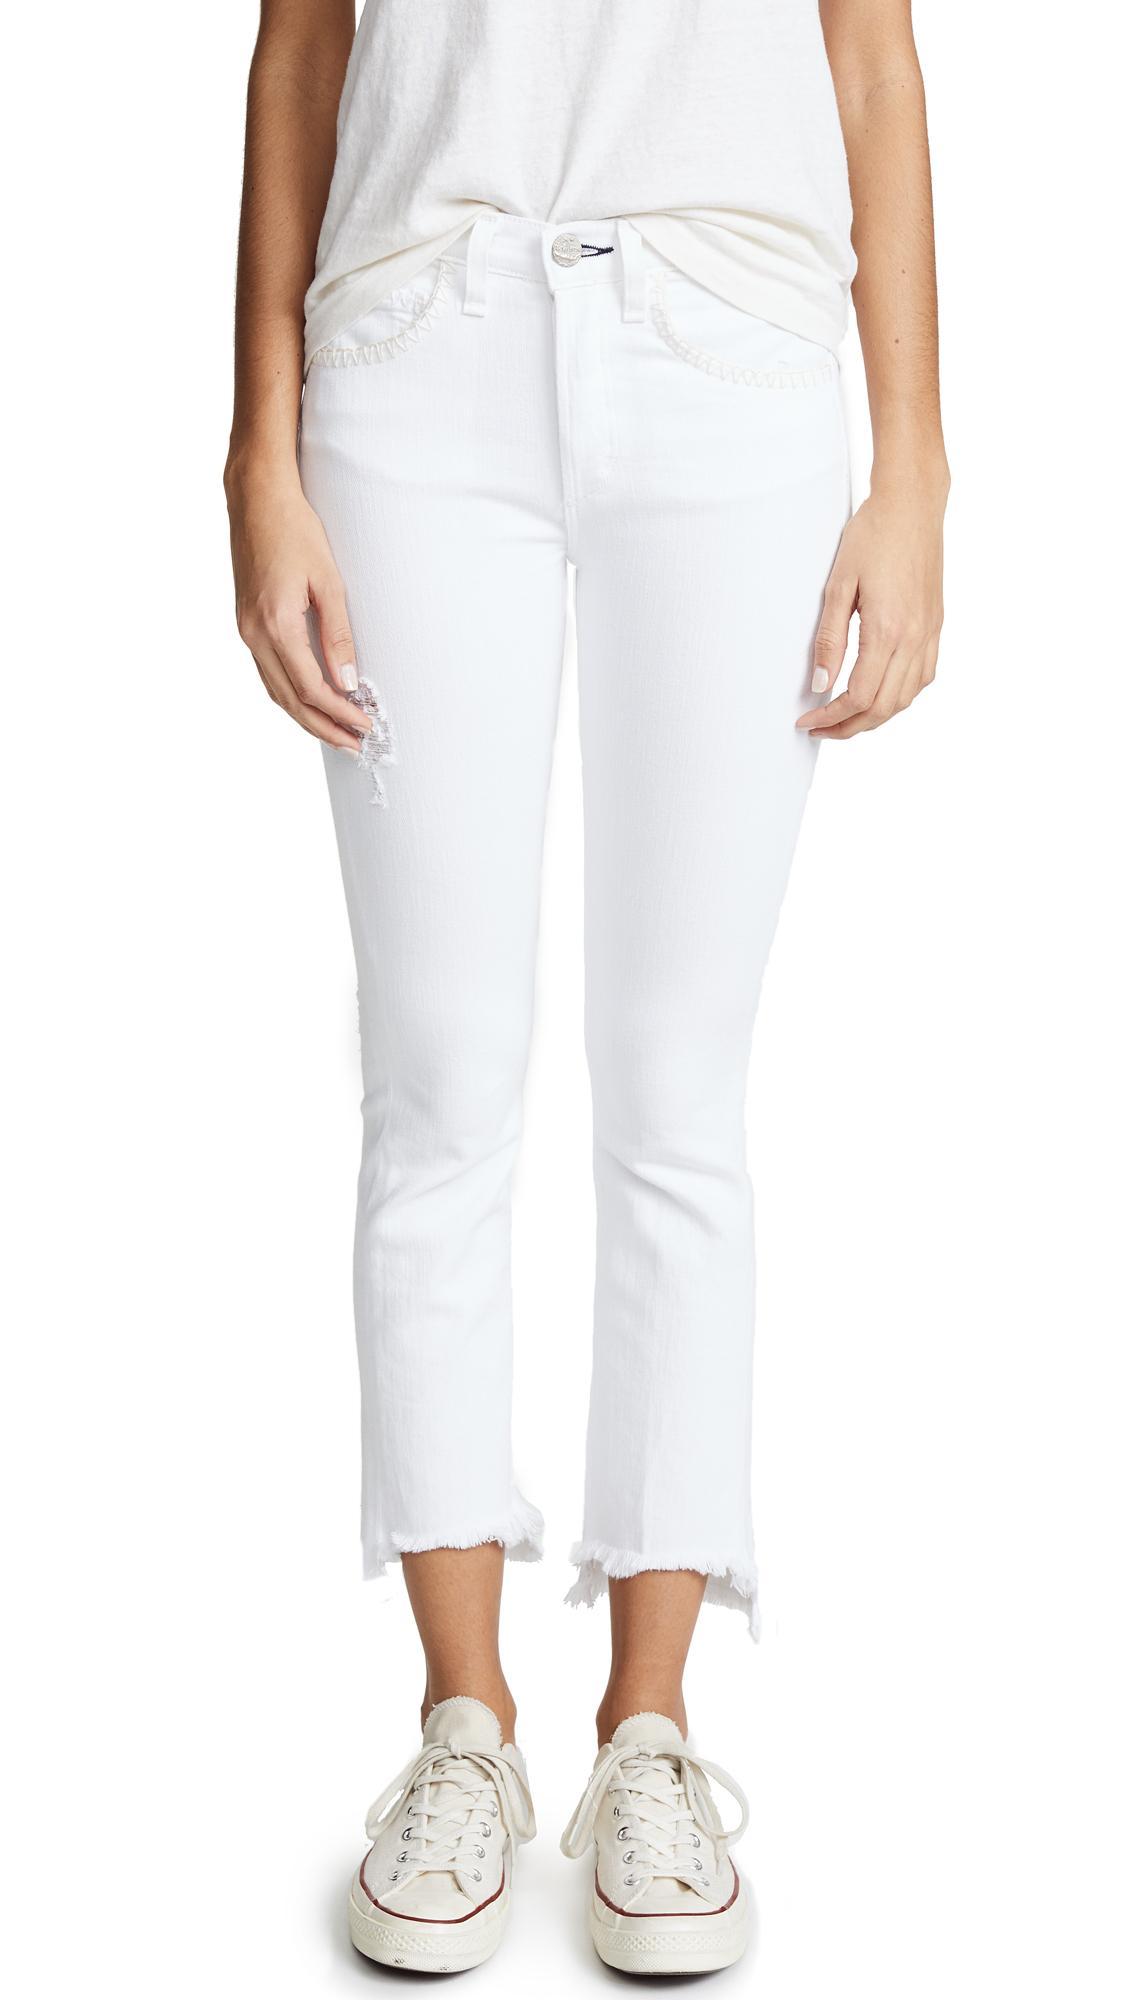 Mcguire Denim Valletta Straight Jeans In Sidari